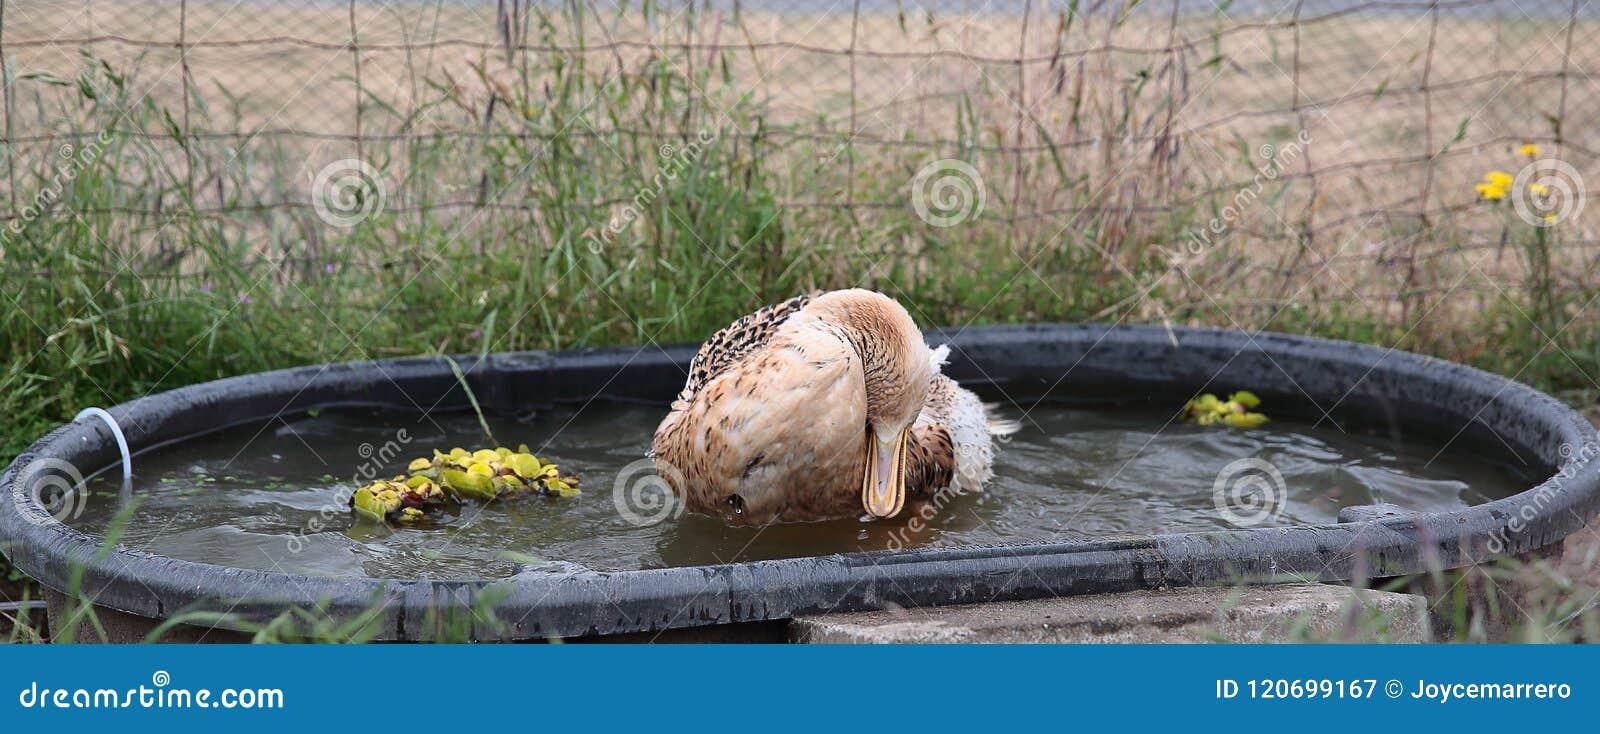 Appleyard Duck Bathing badar in